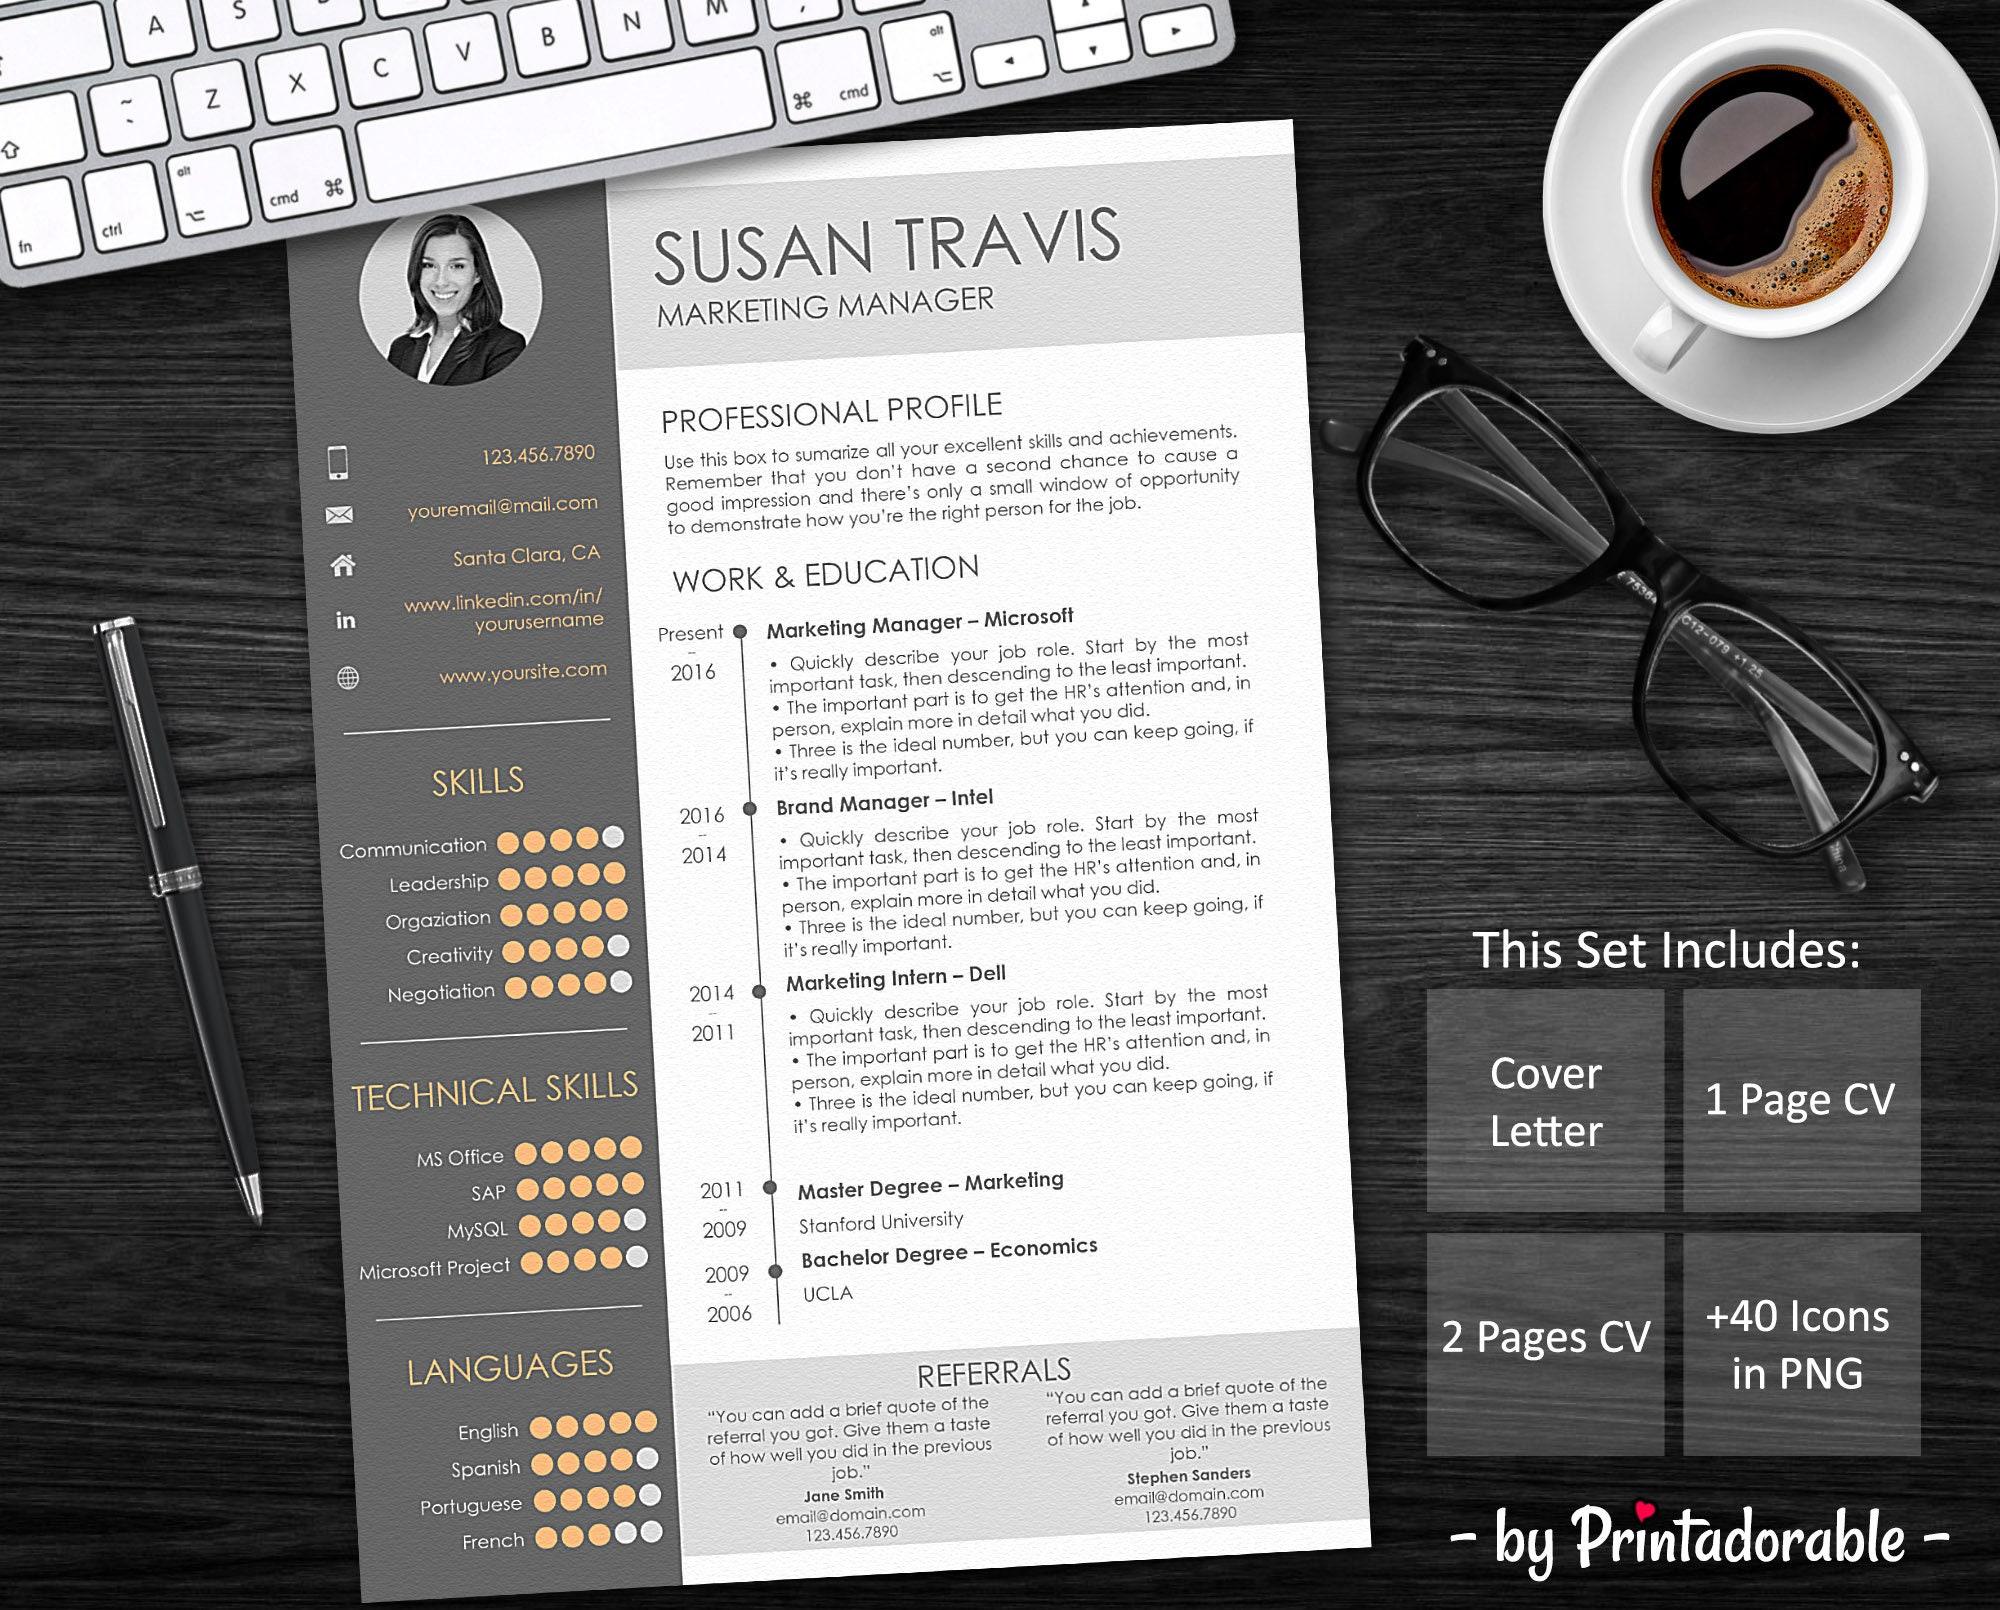 Resume Template - CV Template - Professional Resume - Resume Design ...